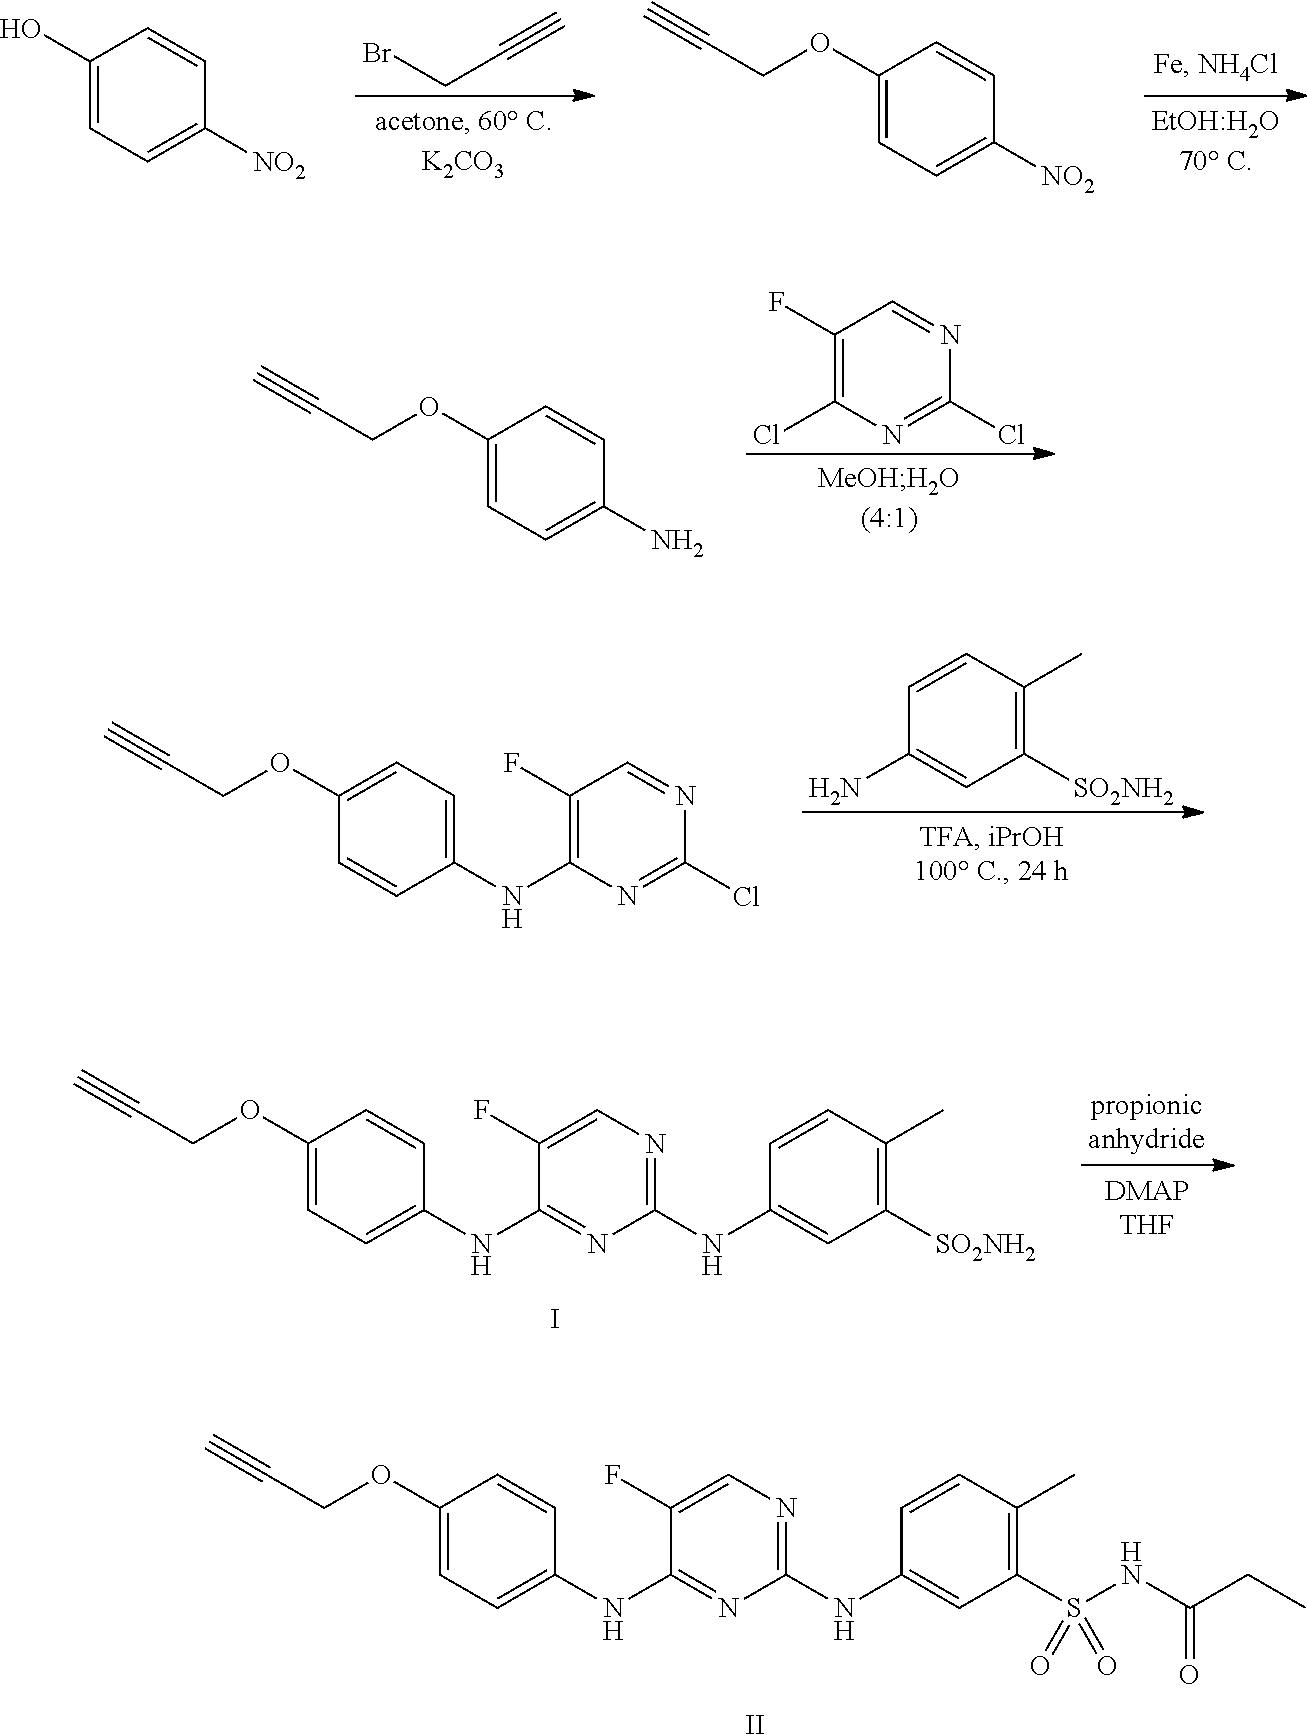 pregabalin used for arthritis